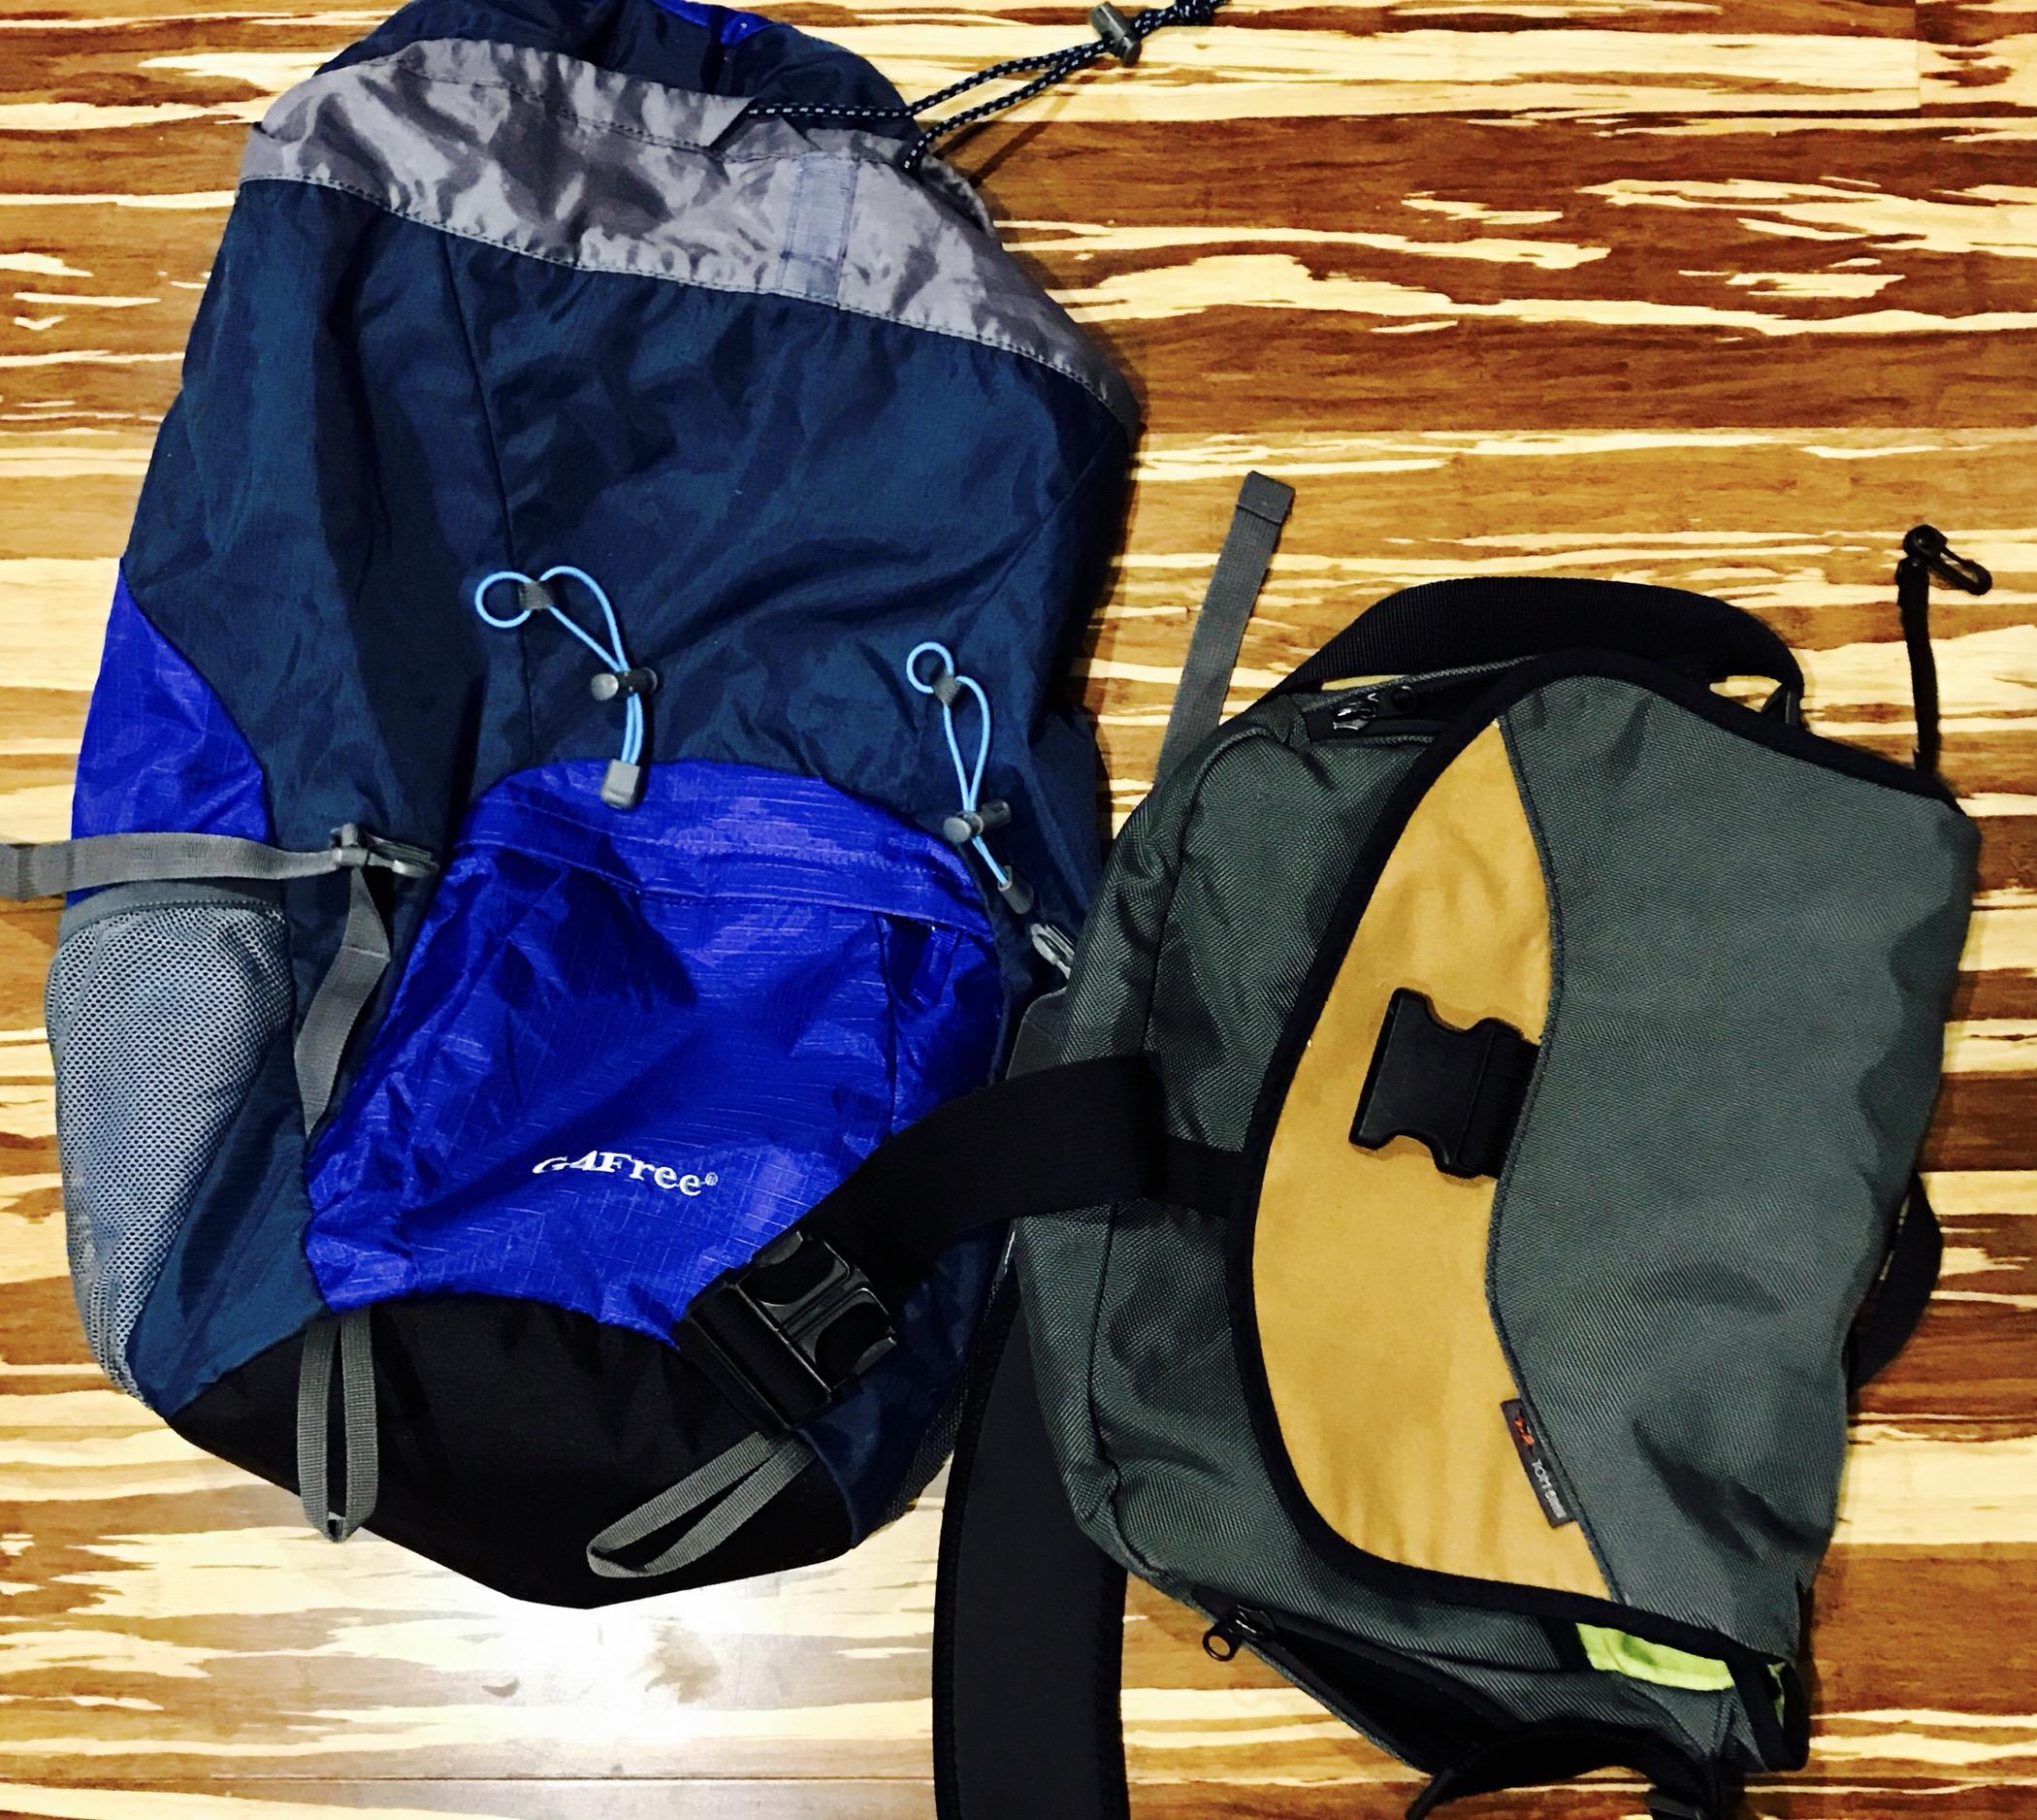 G4free backpack